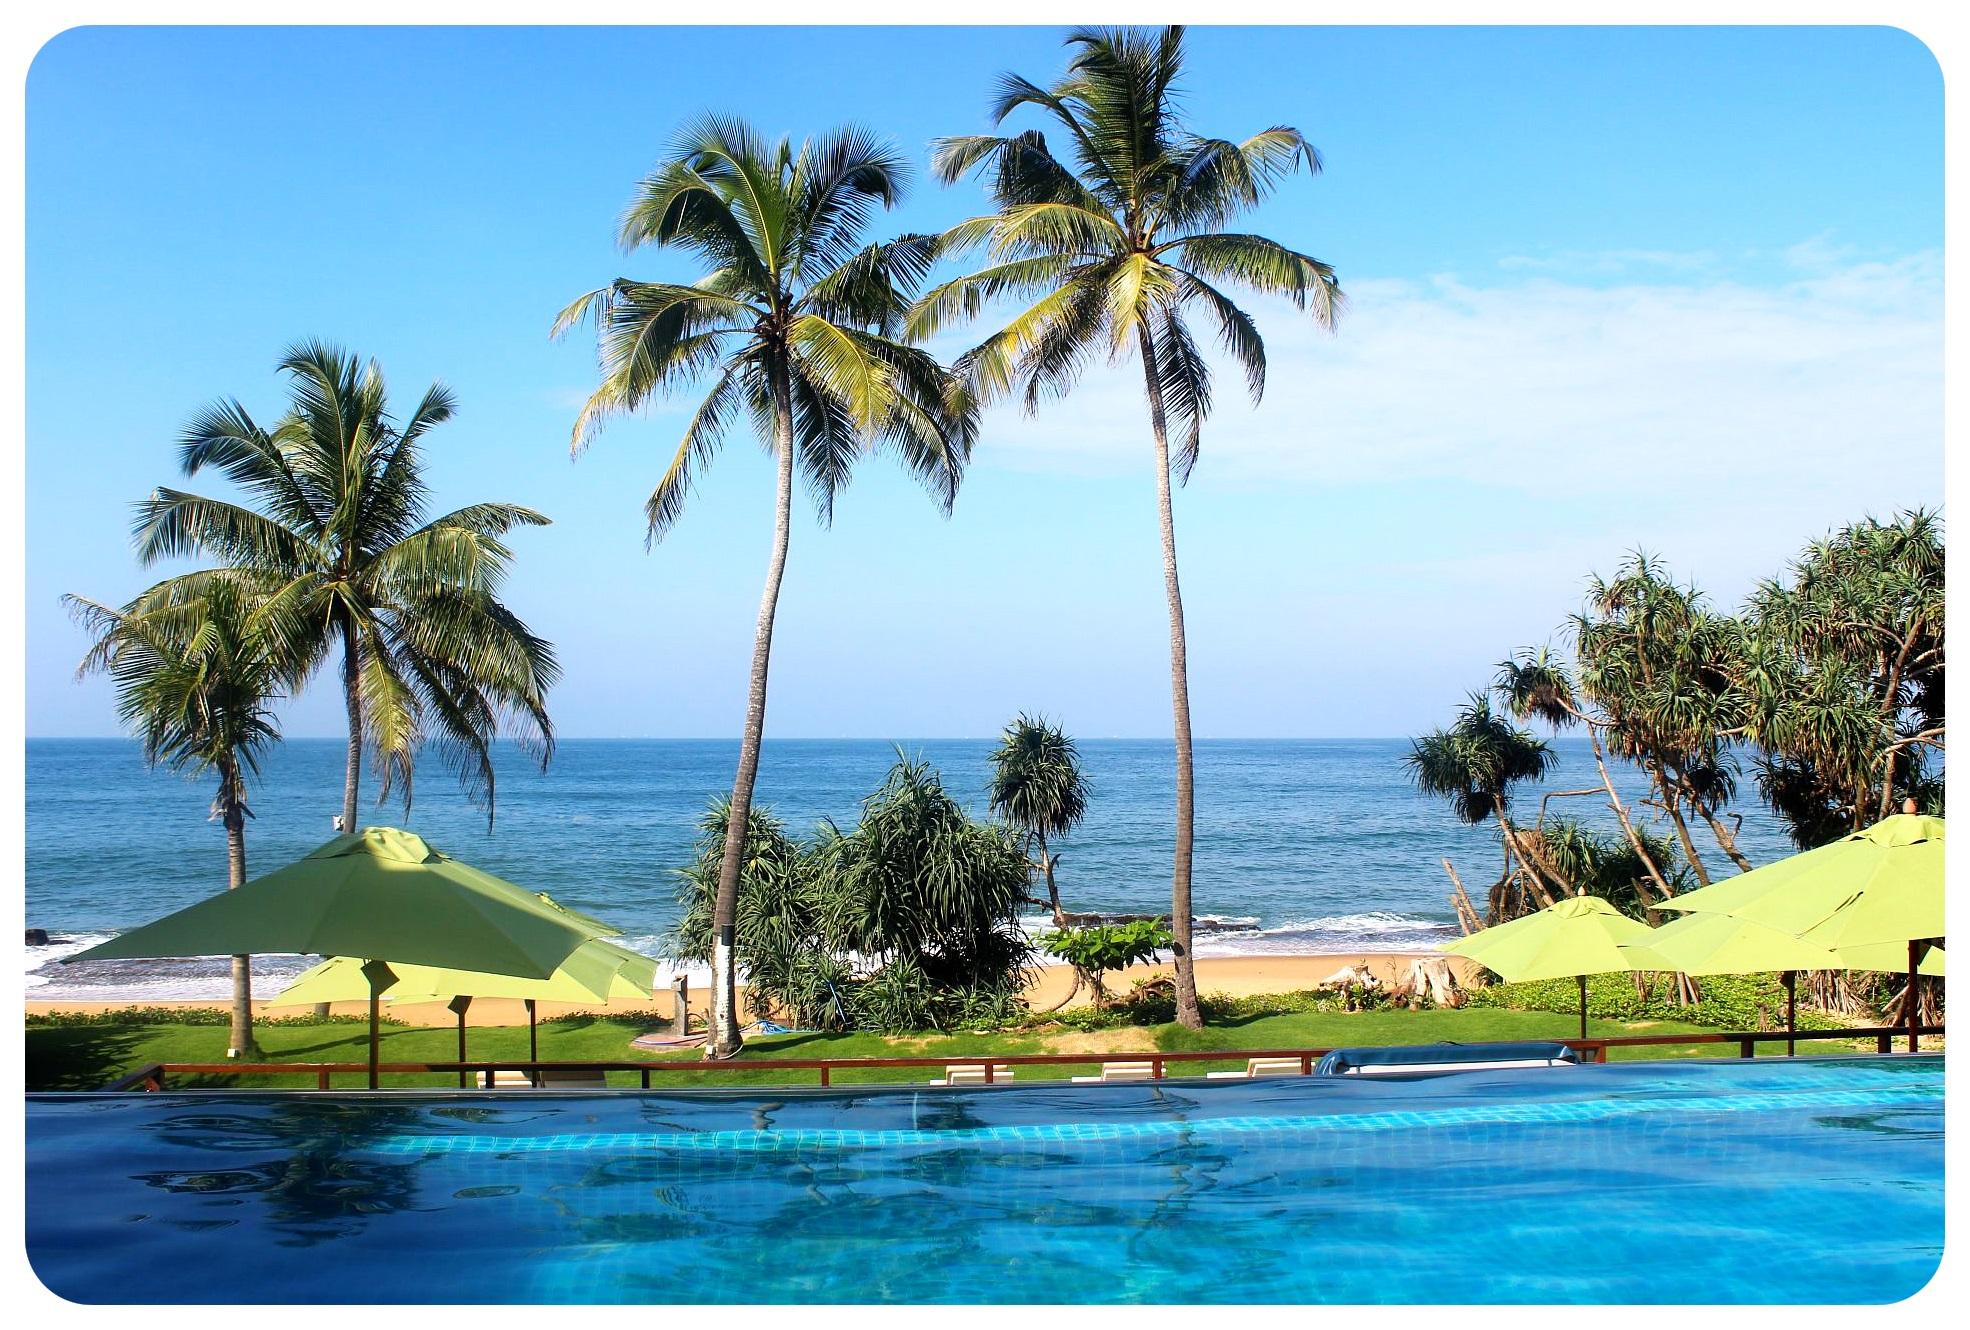 reefs edge hotel infinty pool1